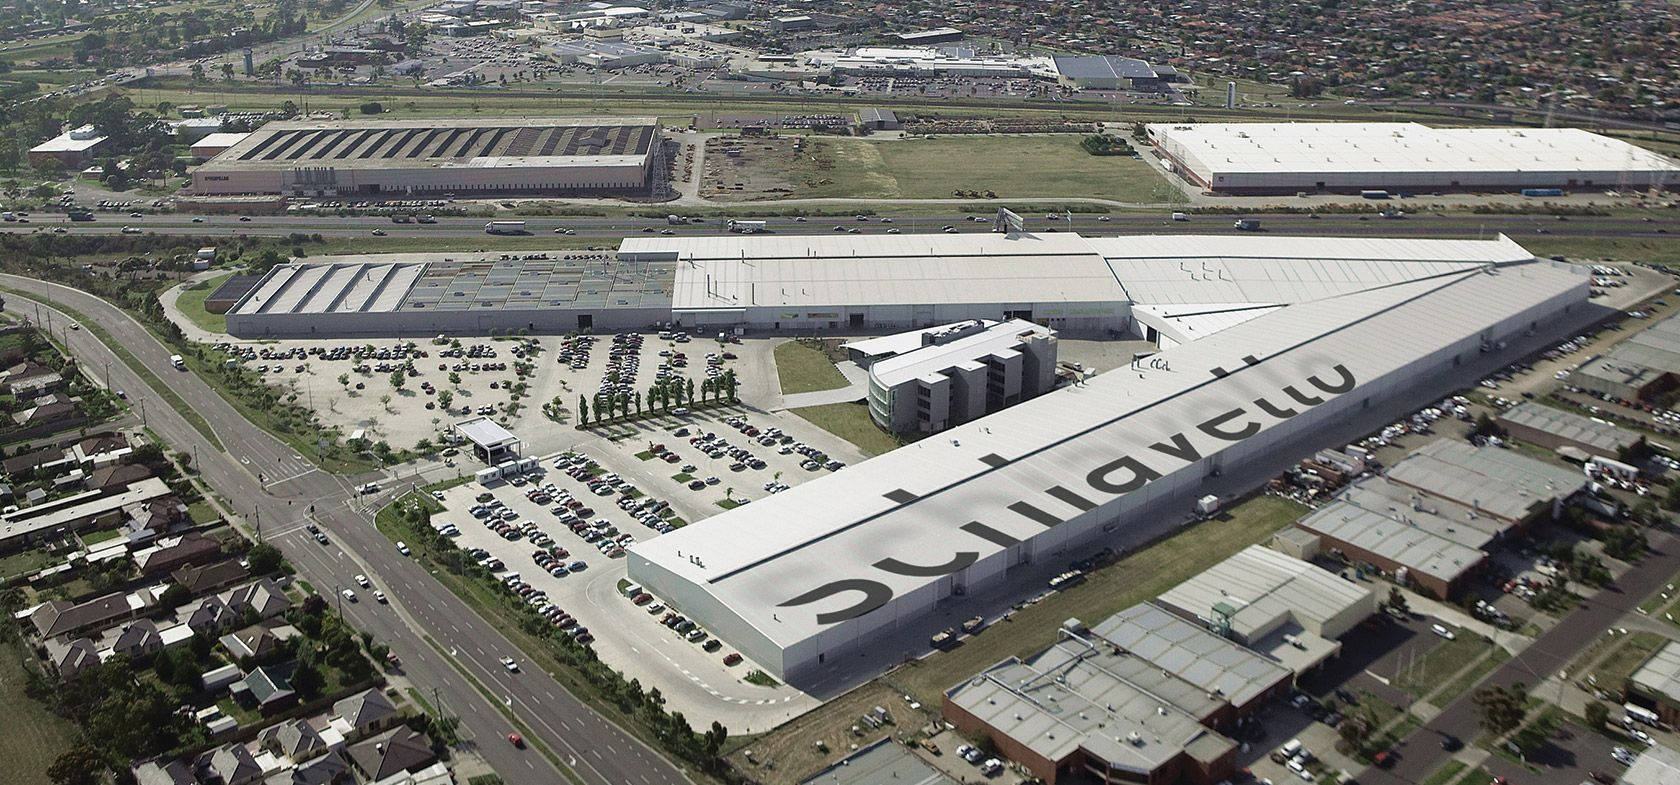 schiavello aerial photo head office and manufacturing facility tullamarine